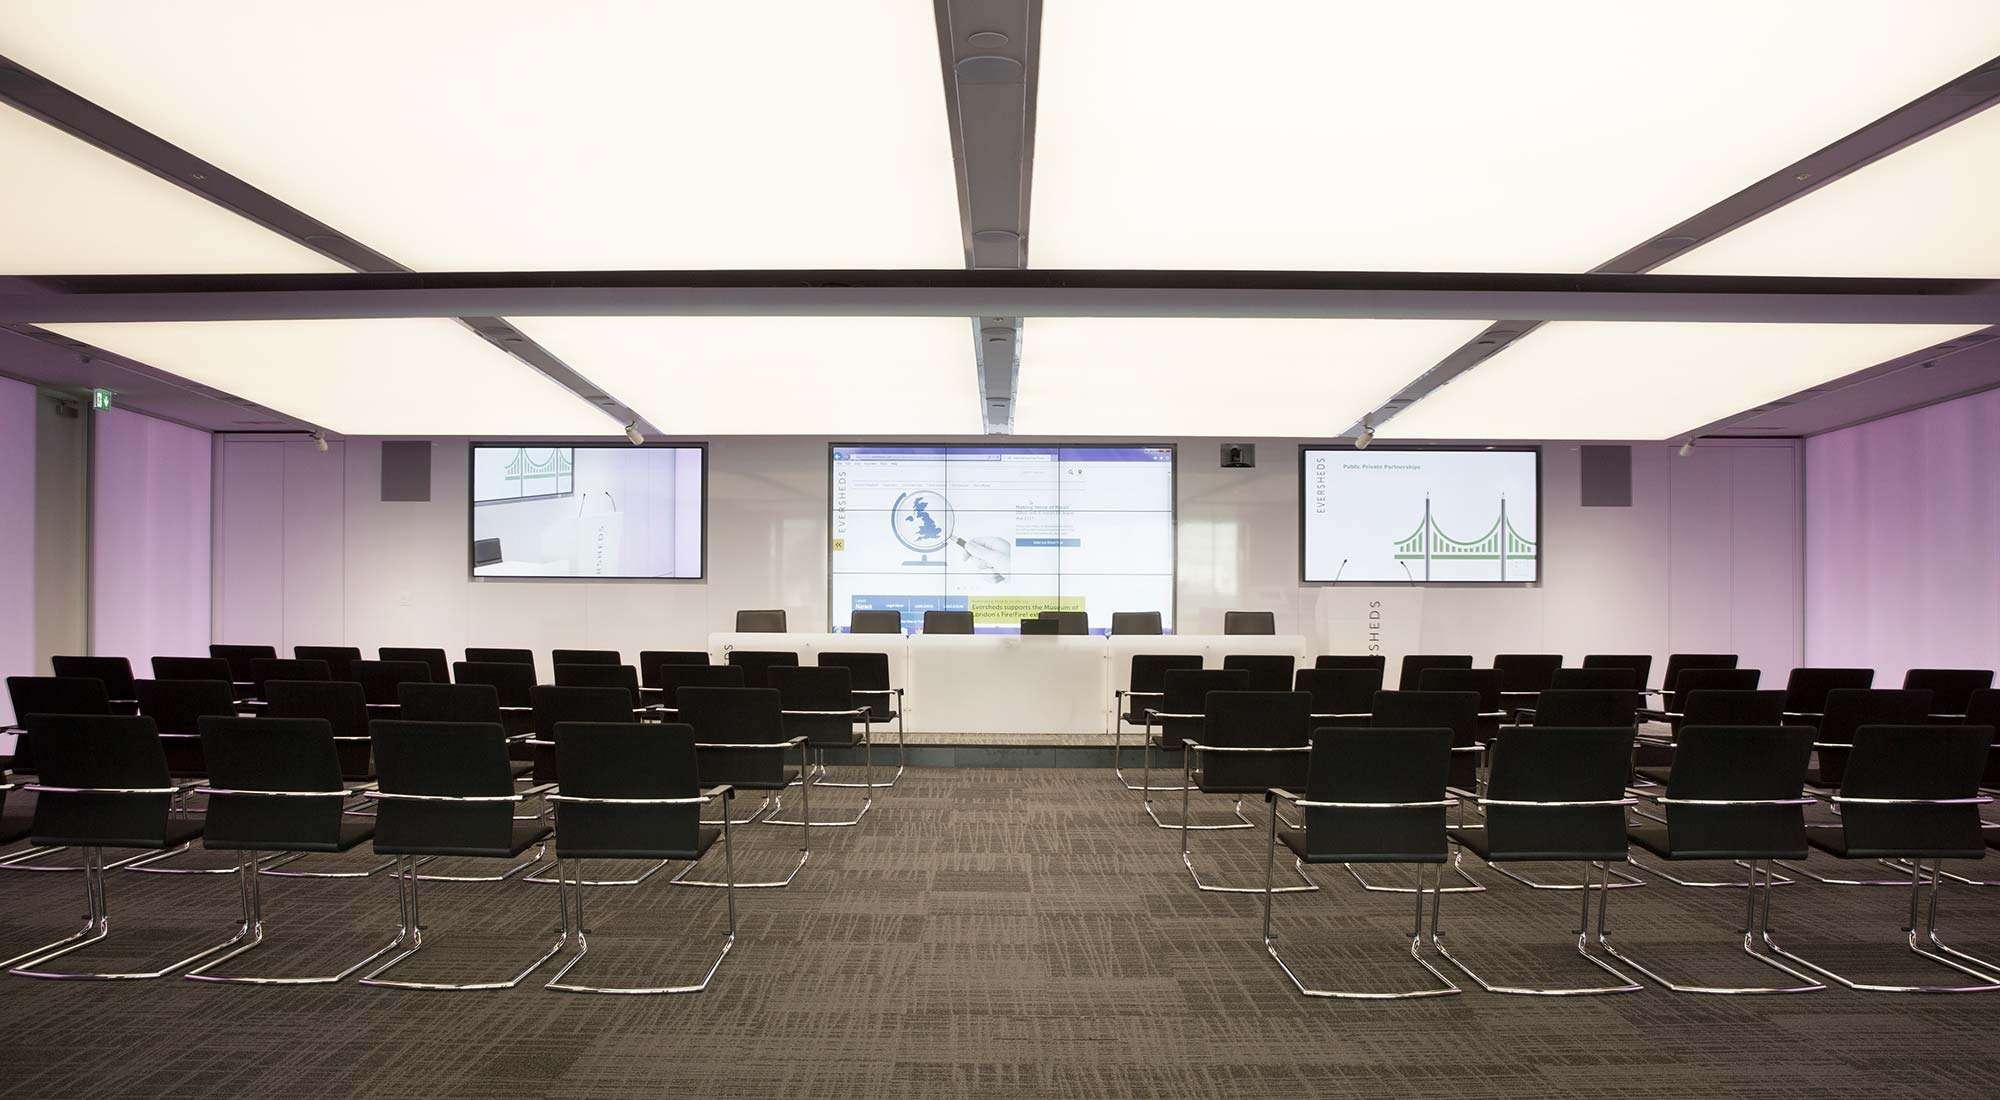 london hq auditorium feature lighting colour led walls light raft